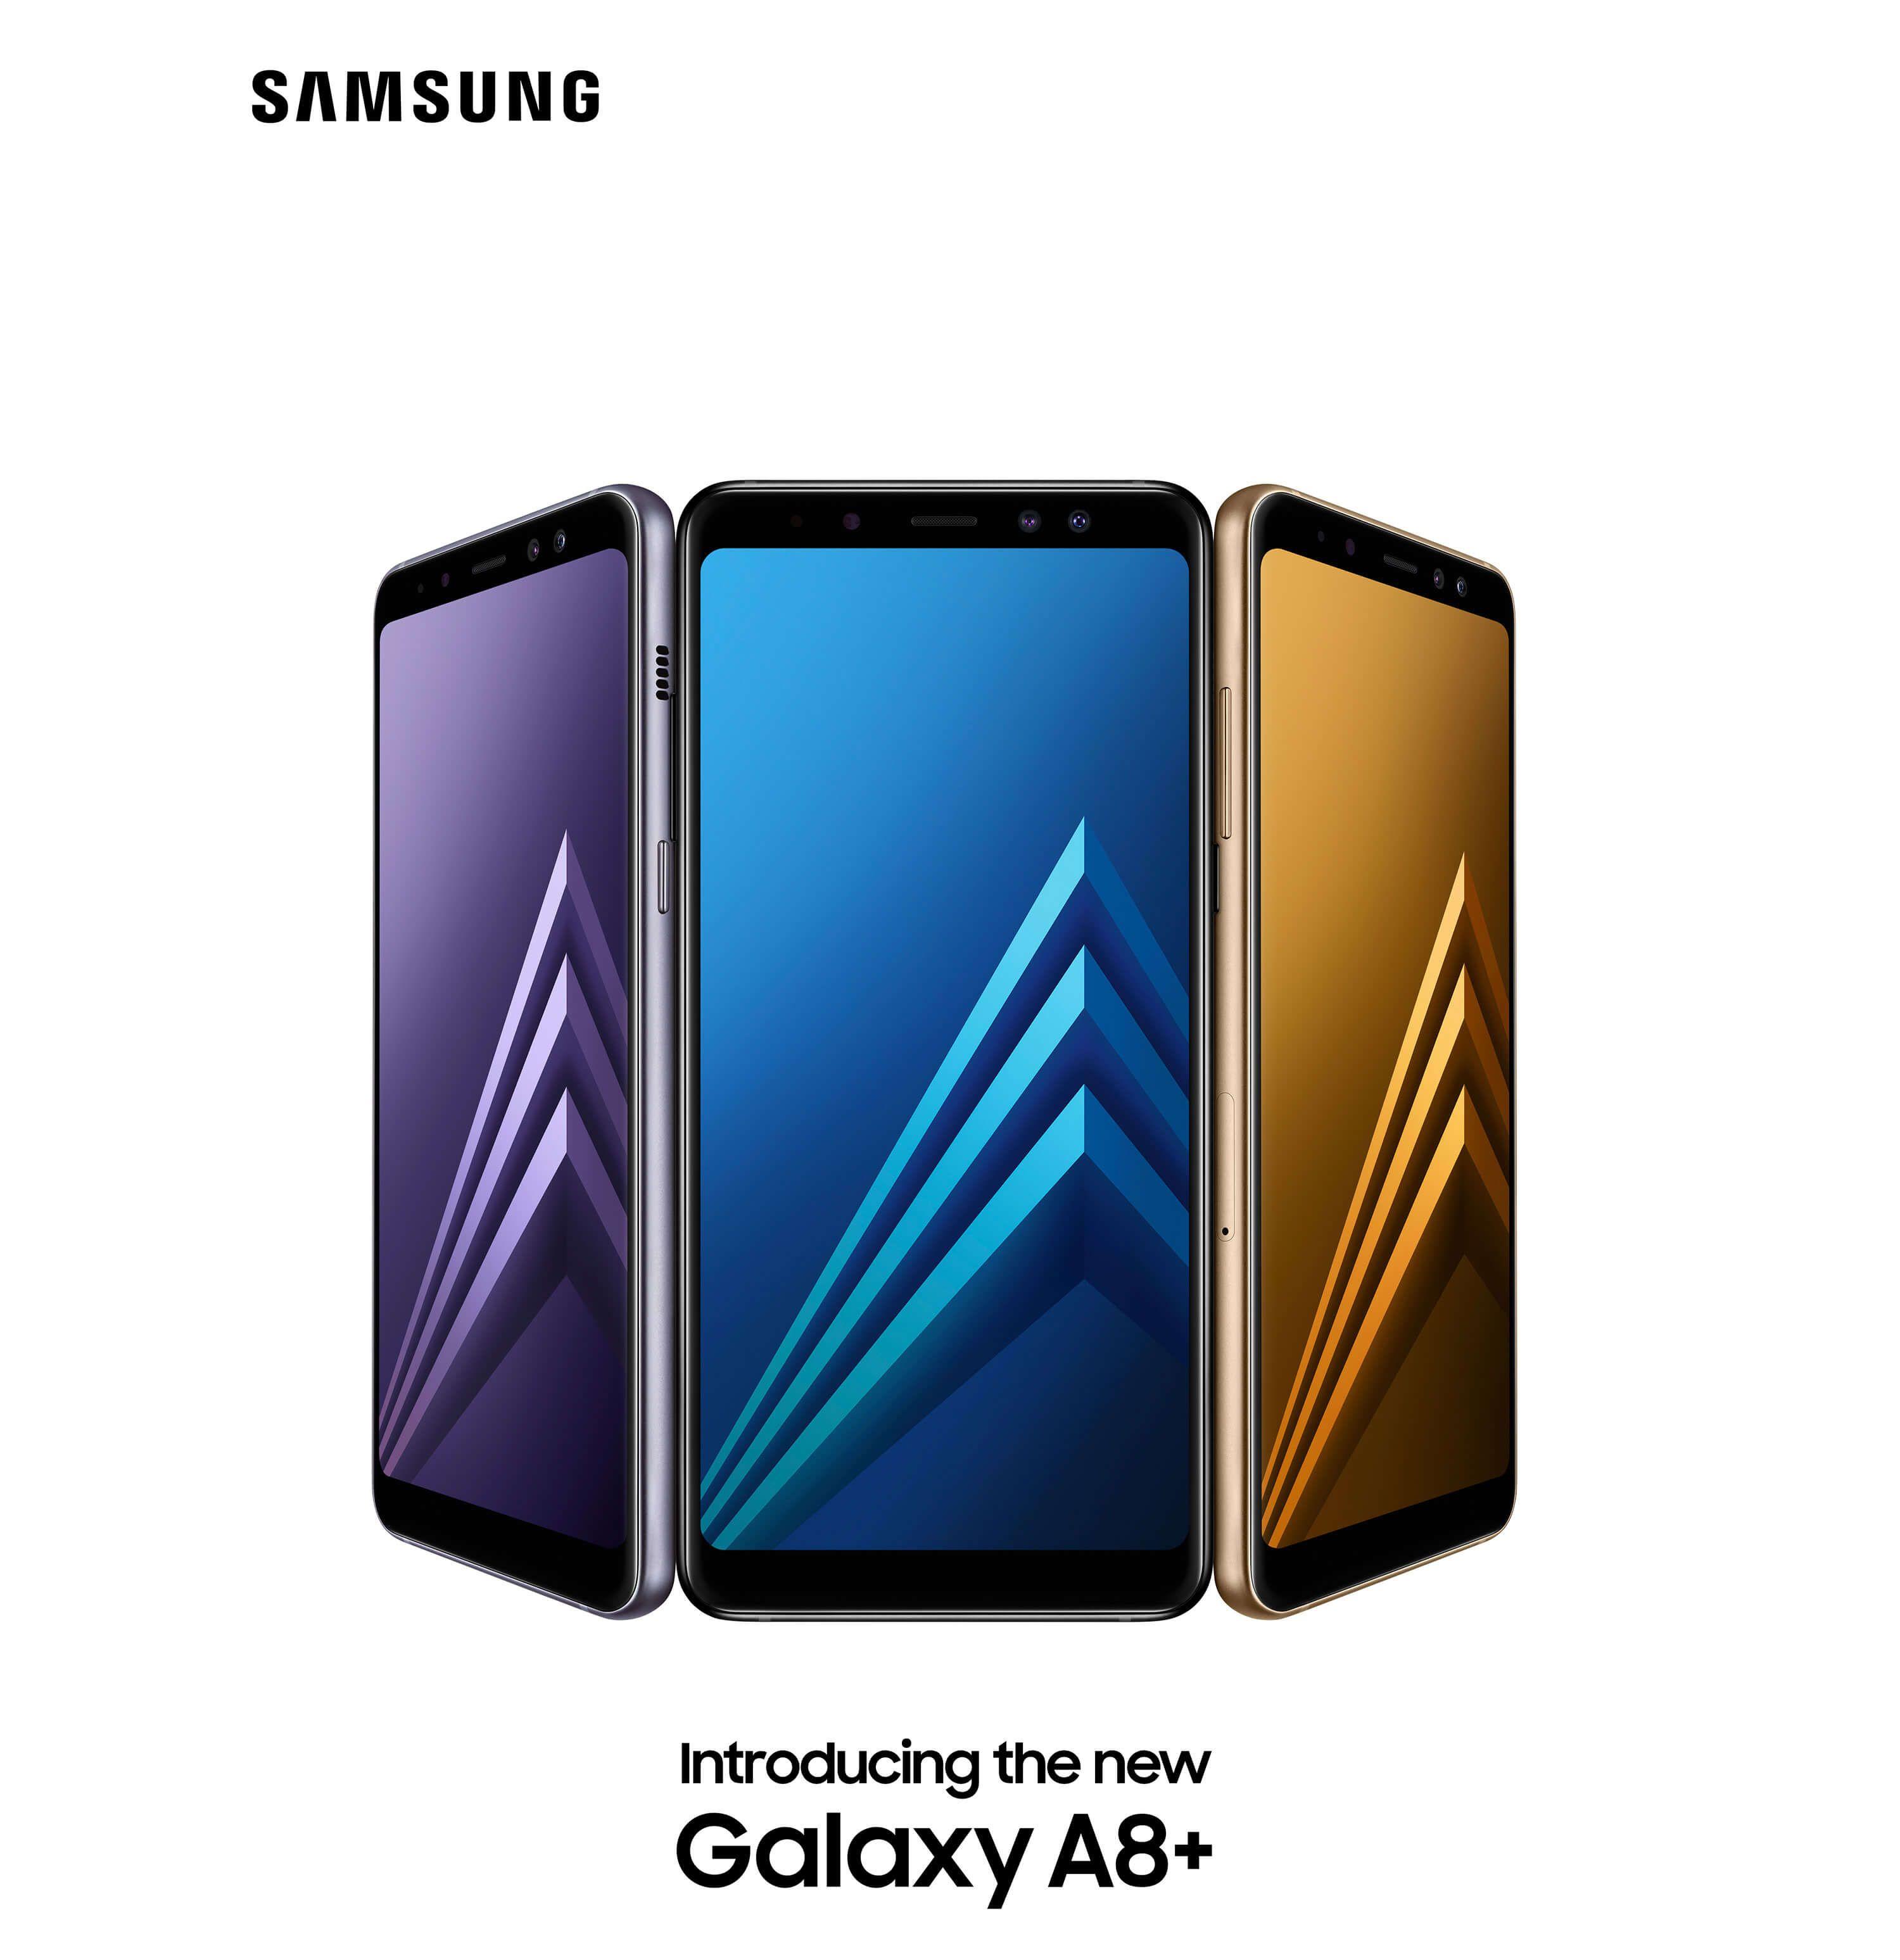 Samsung Galaxy A8 2018 und Galaxy A8 2018 offiziell vorgestellt